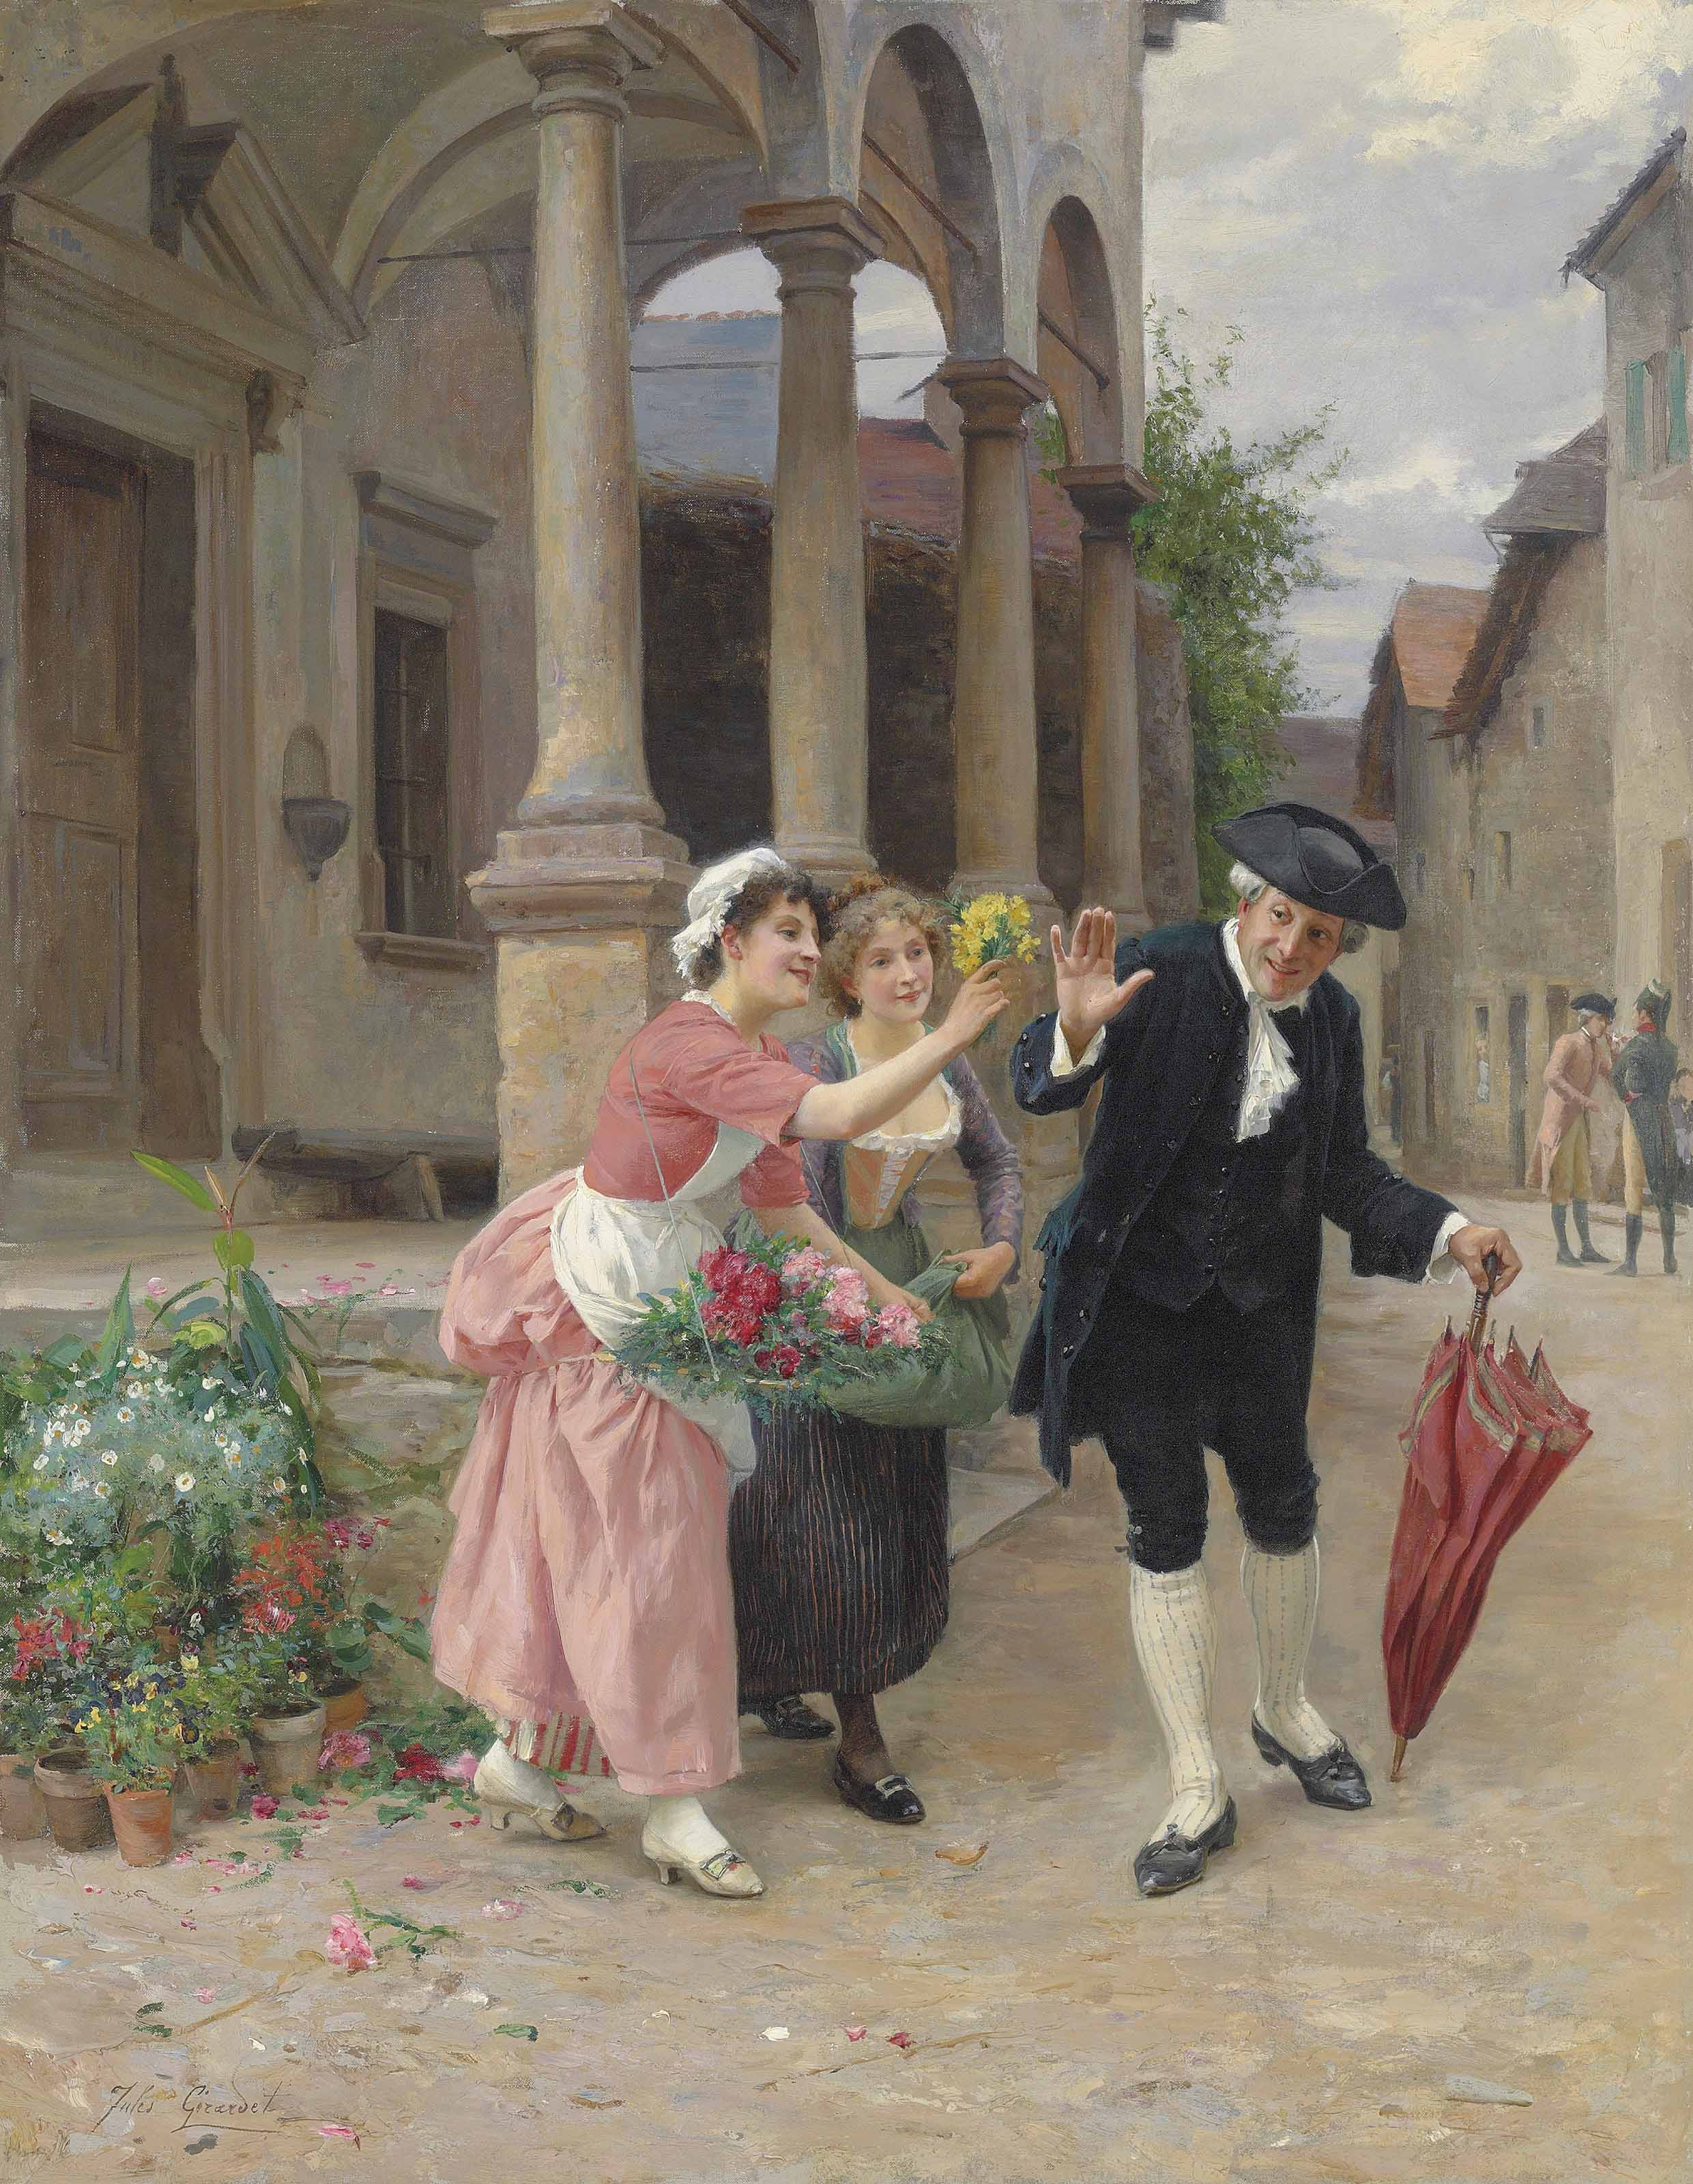 Jules Girardet (French, 1856-1